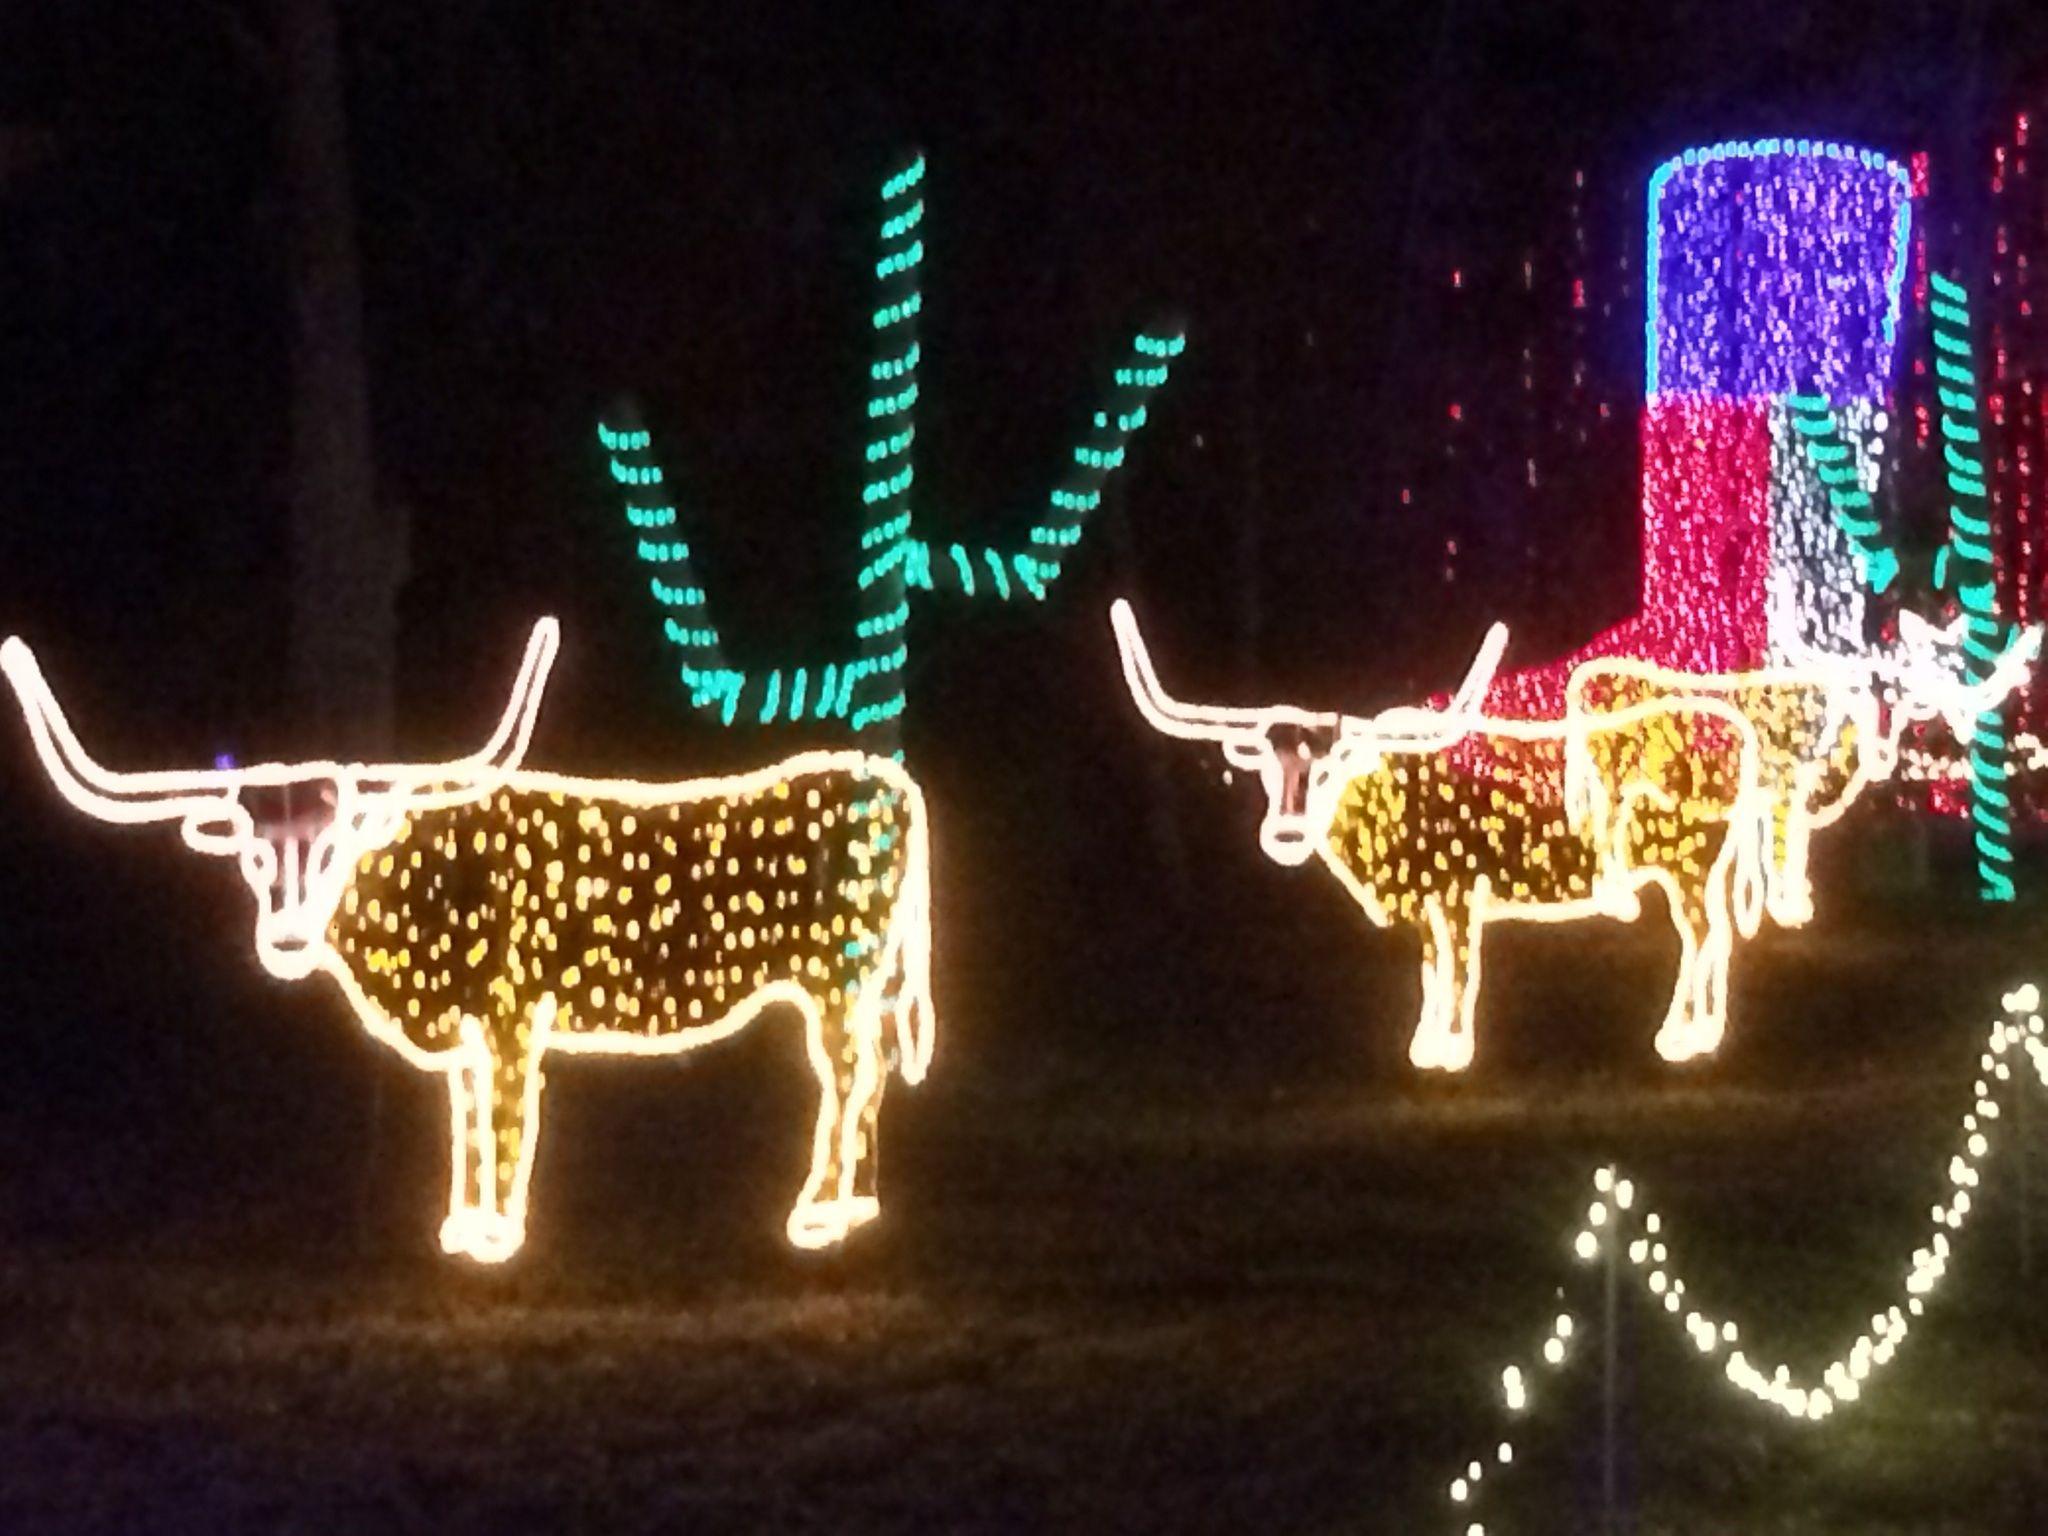 merry longhorn christmas the university of texas at austin